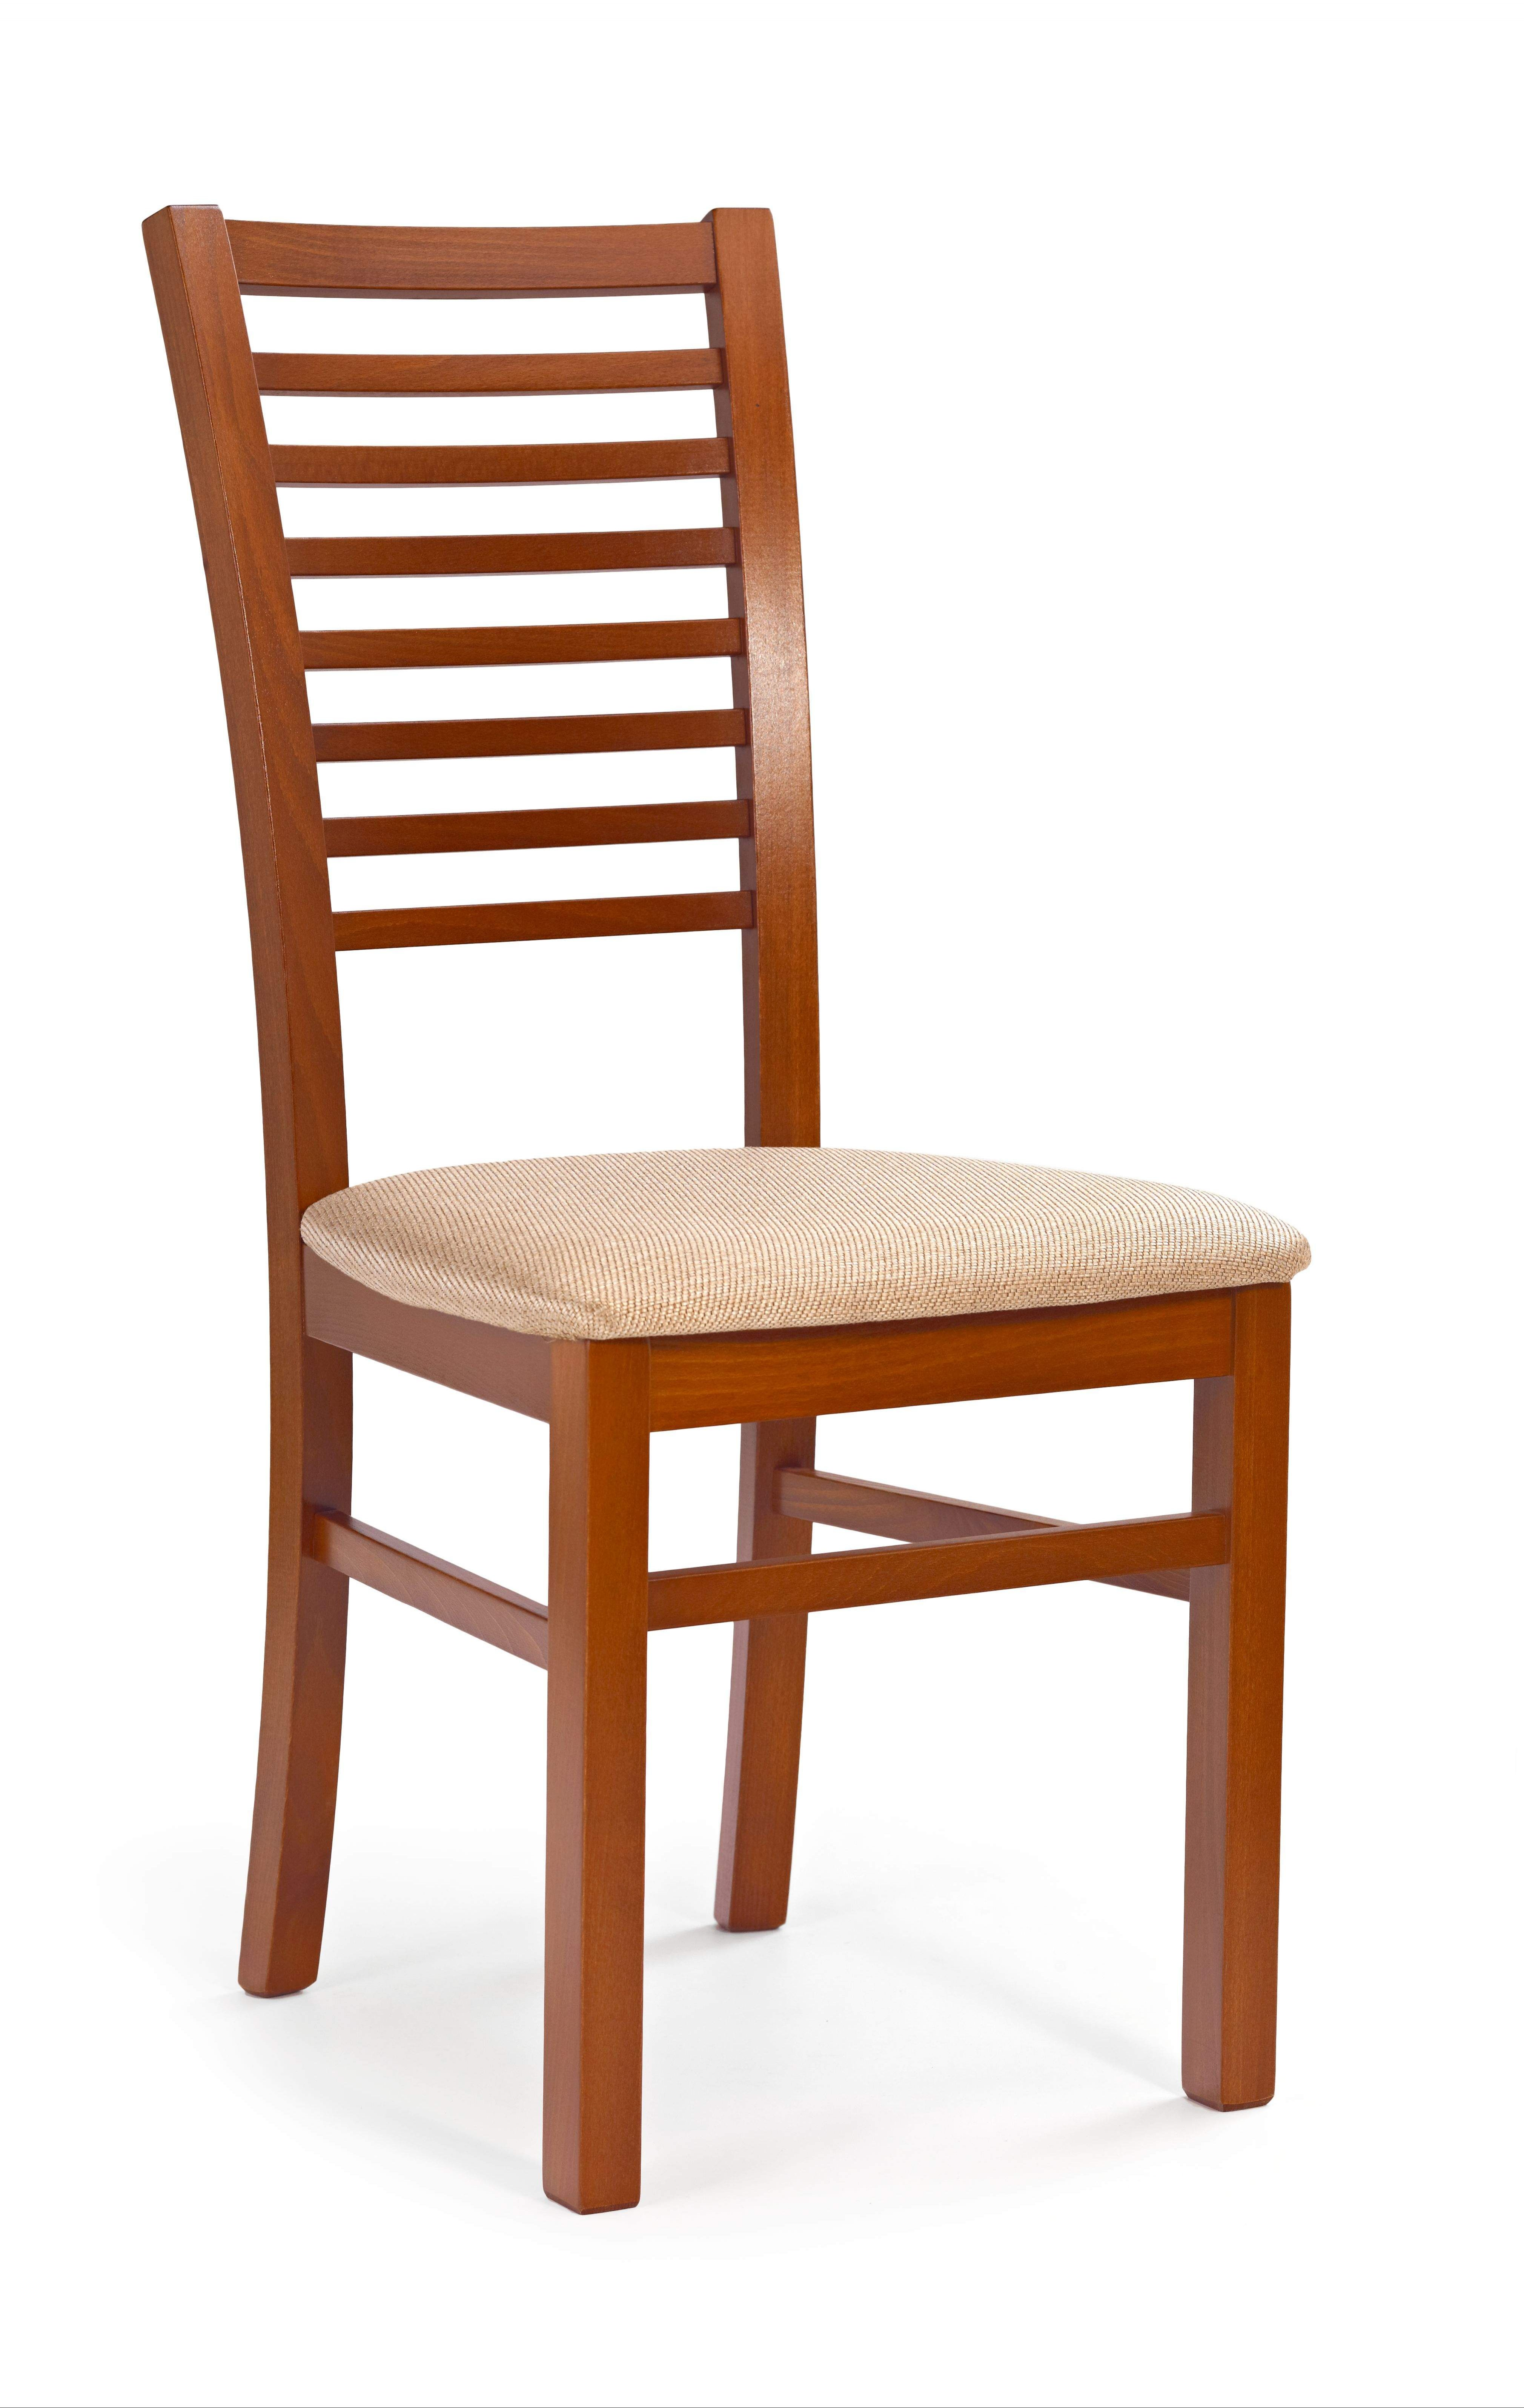 Kėdė GERARD 6 vyšnia